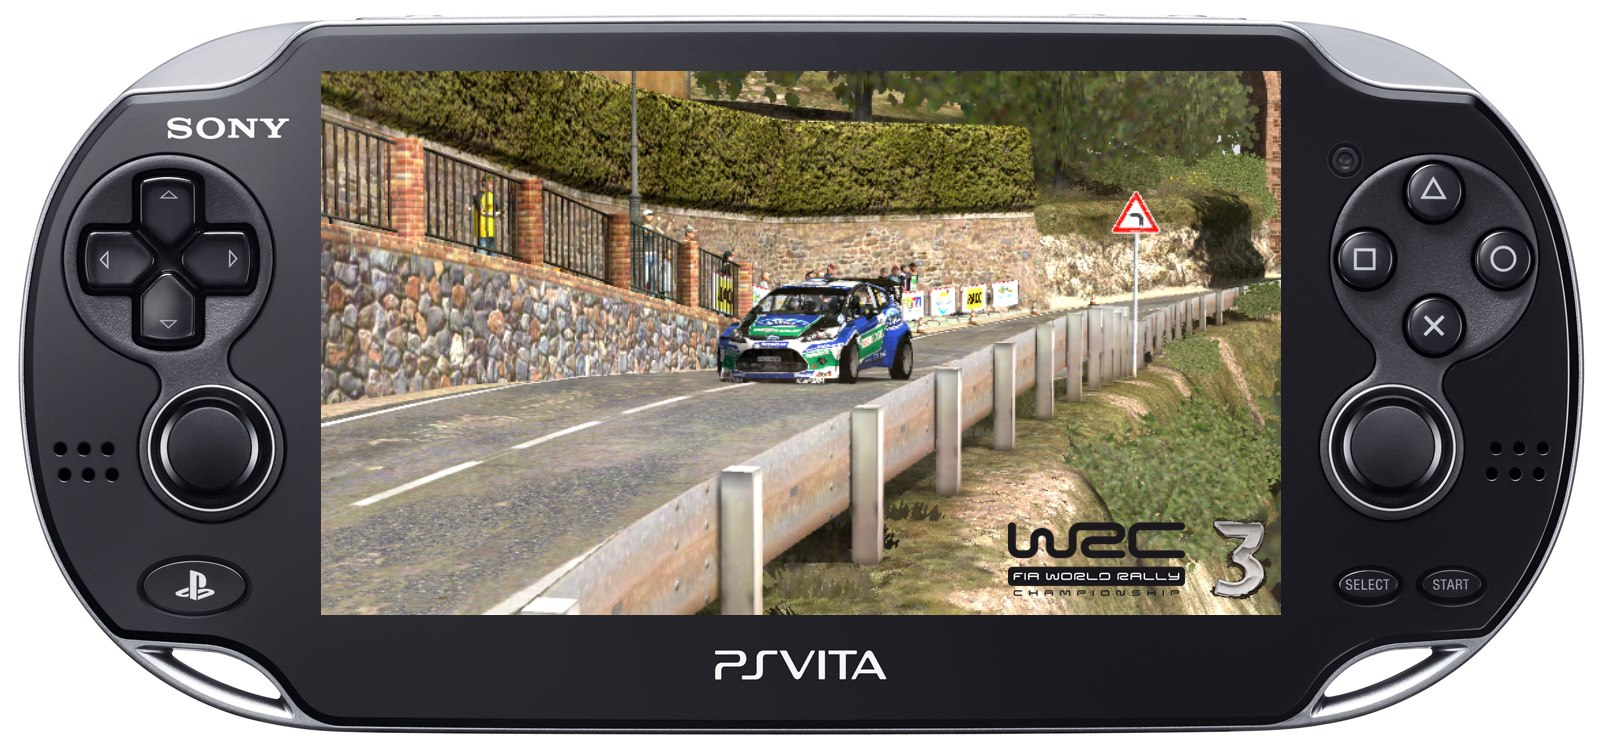 WRC3 Vita first look hands-on